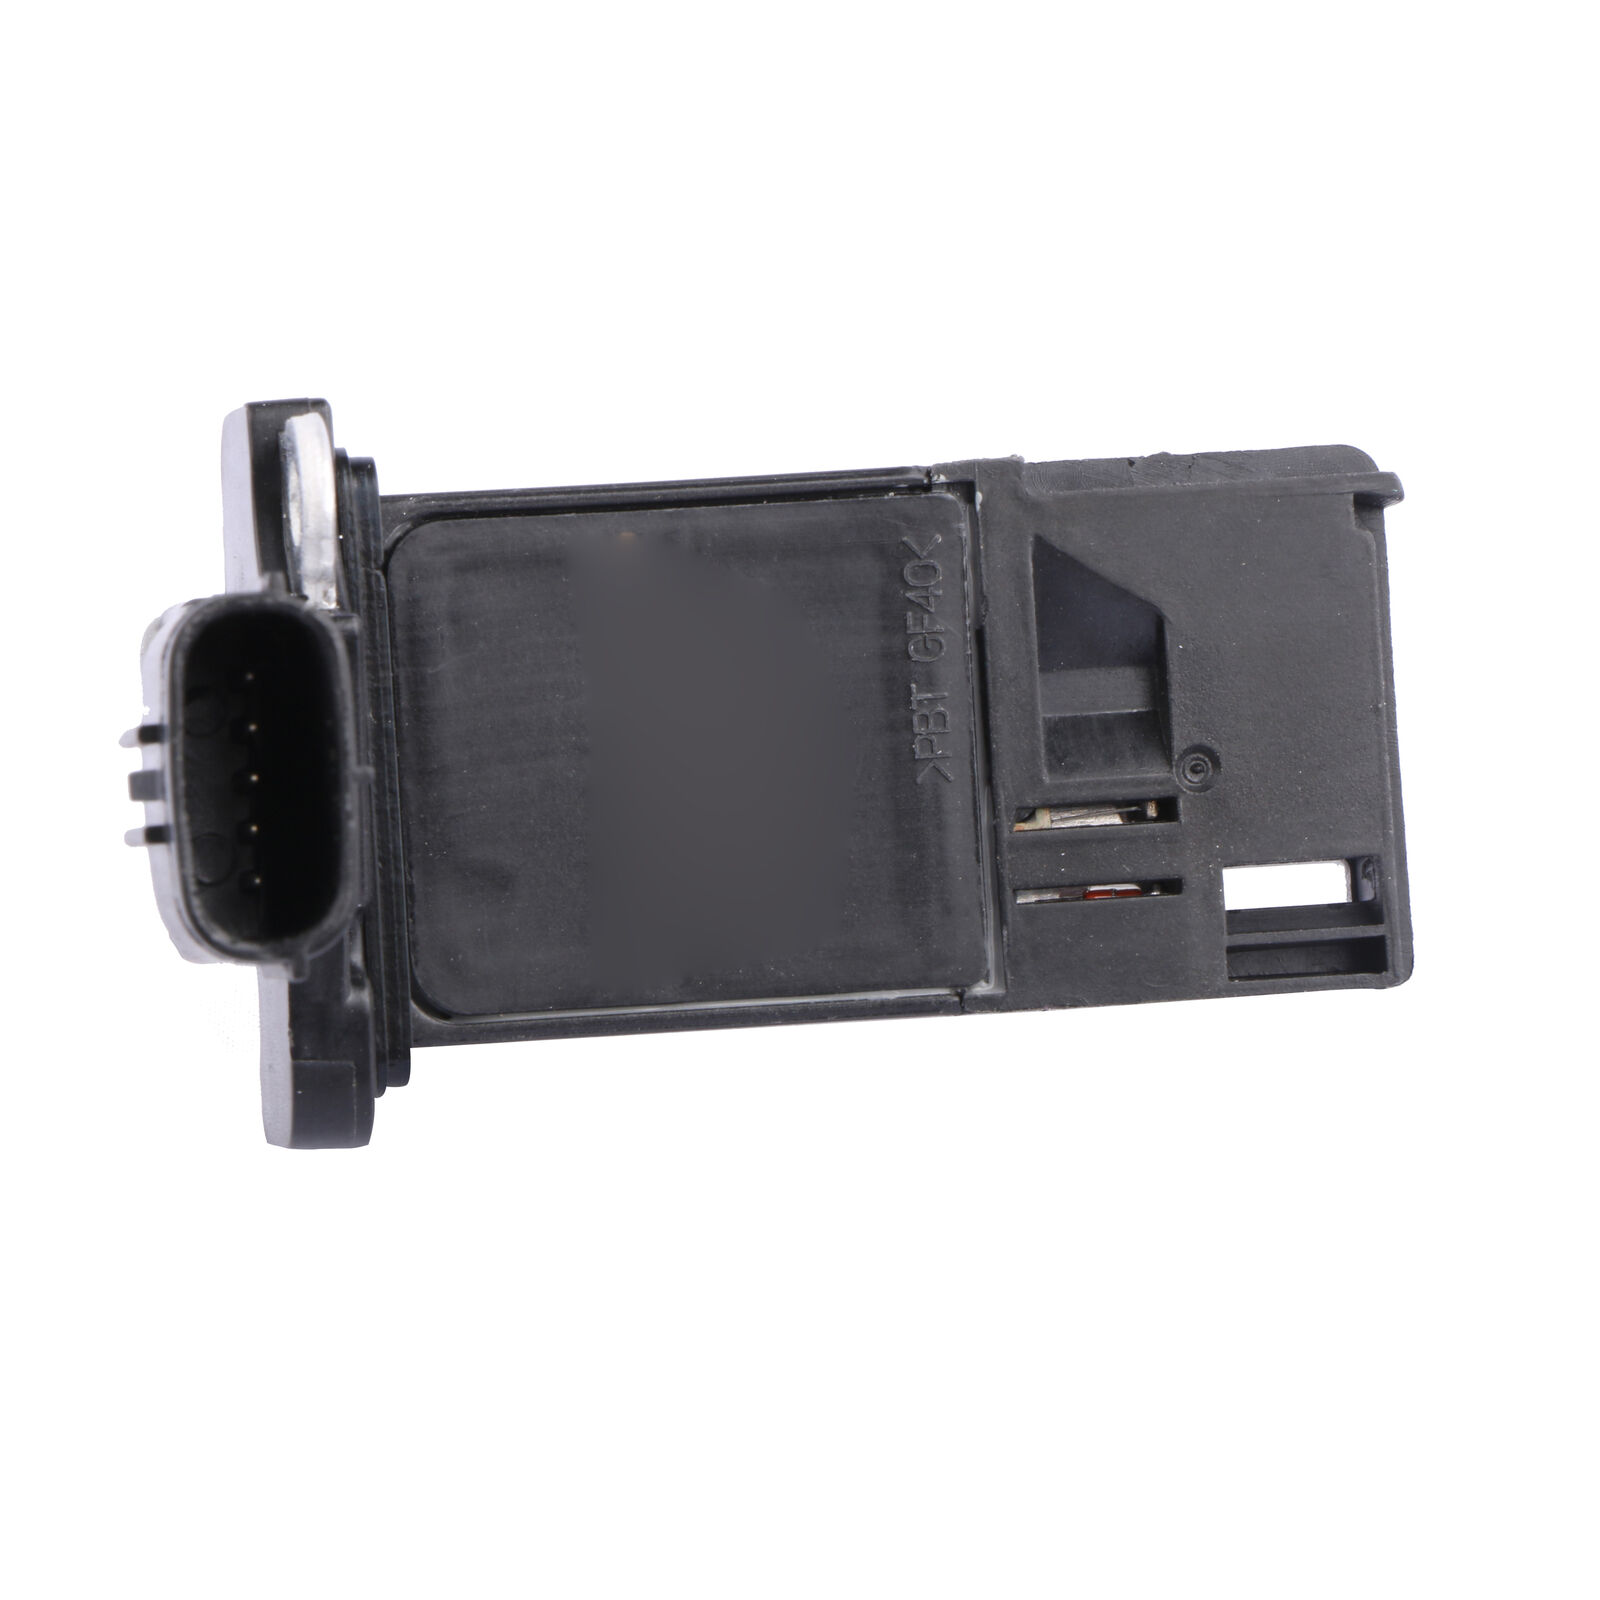 Mass Air Flow Sensor F782JC for NQR NPR HD NRR 2007 2006 2005 2008 2009 2010